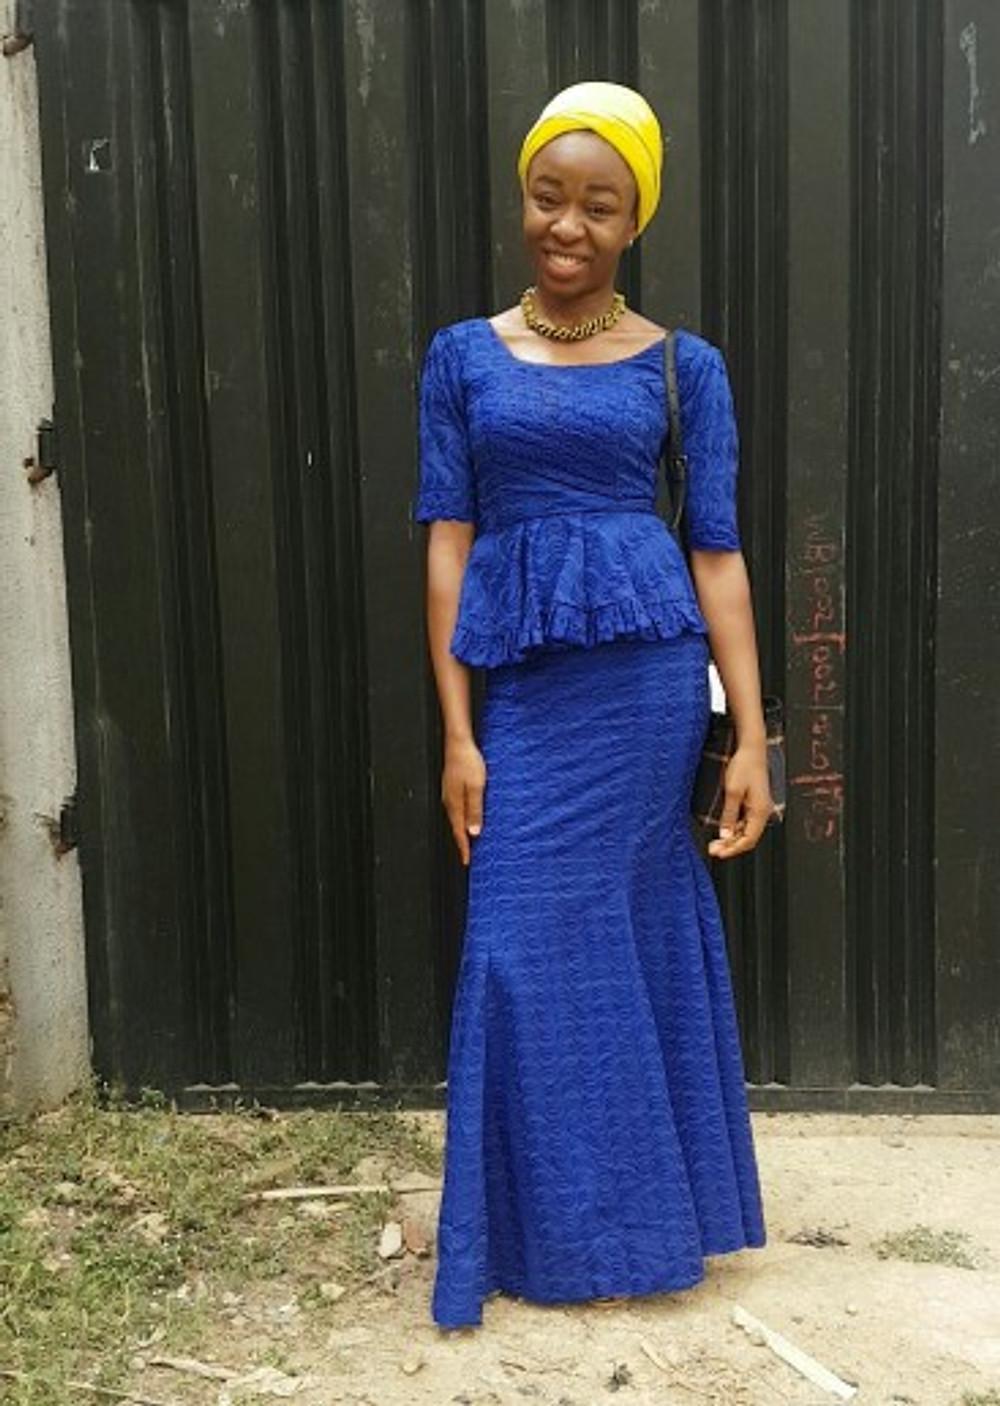 Marvelous Nwakozo, March 2018.